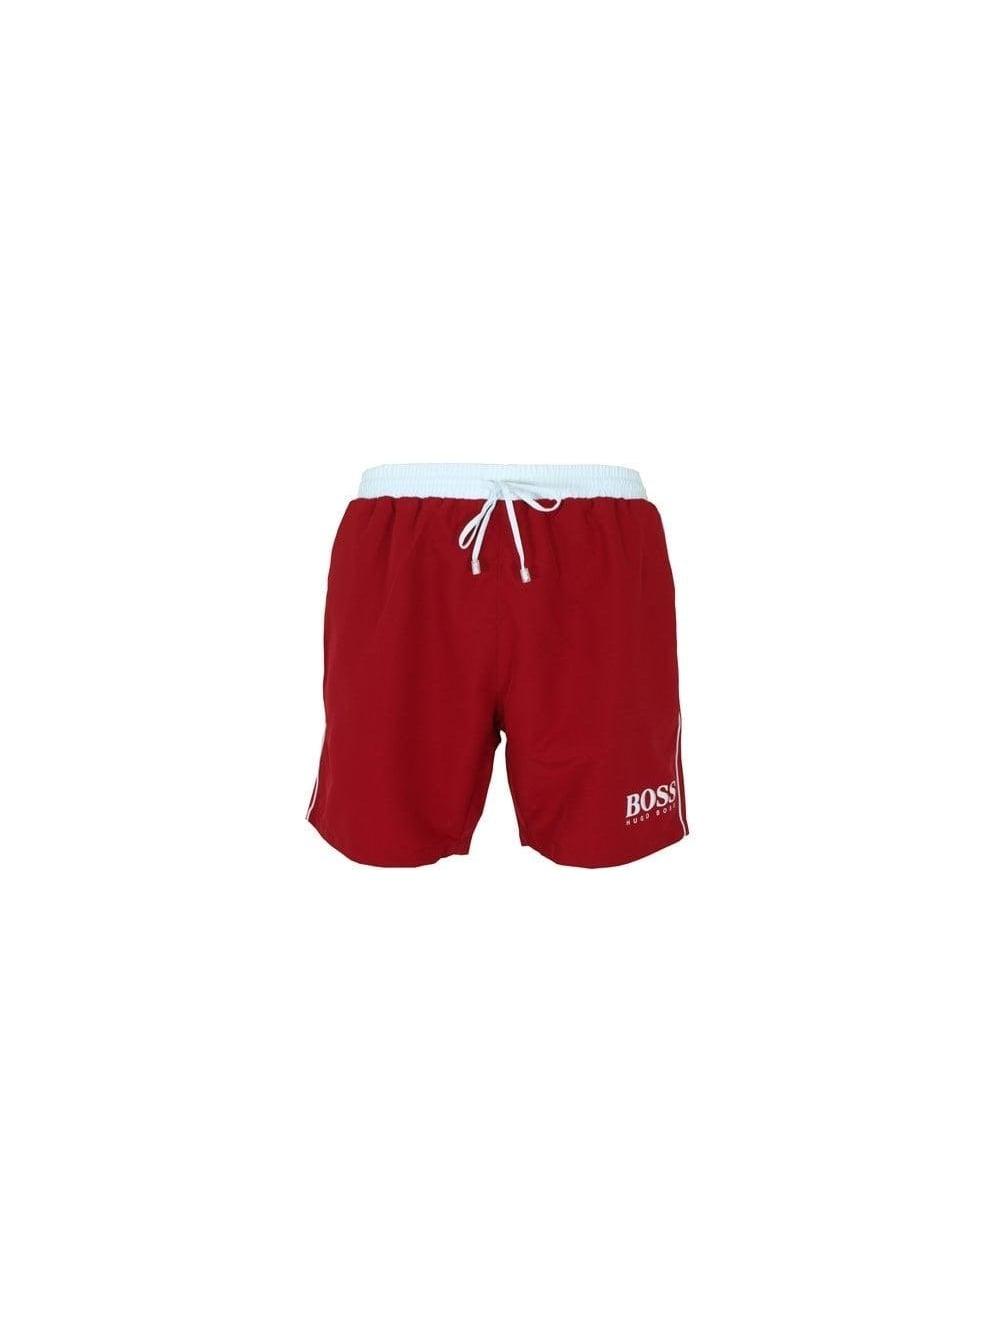 b759de2a2 Hugo Boss Green Starfish Swimming Shorts in Medium Red - Buy Hugo ...